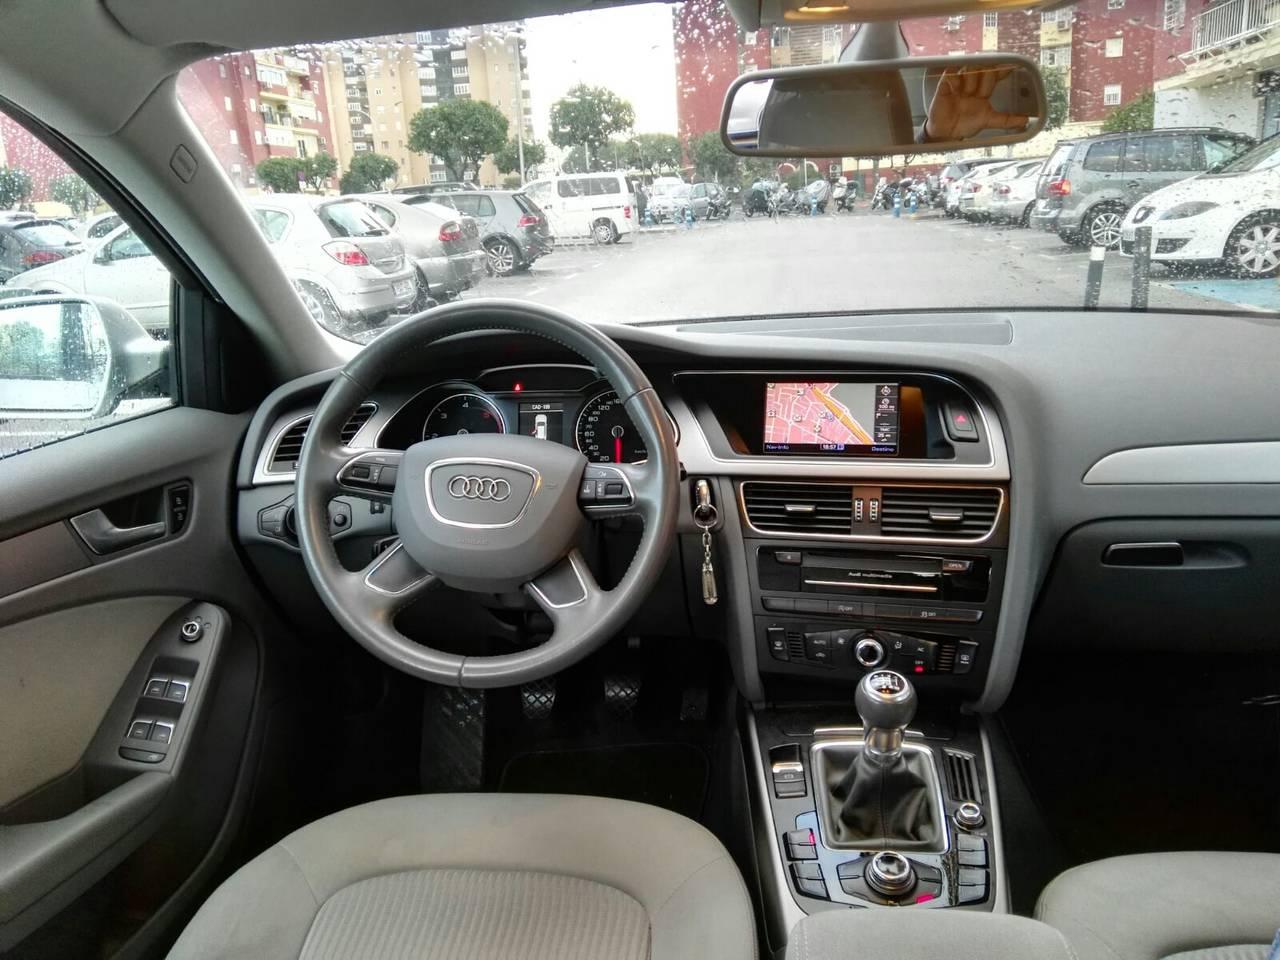 Audi A4 Avant 2.0 TDI 136cv...  - Foto 1